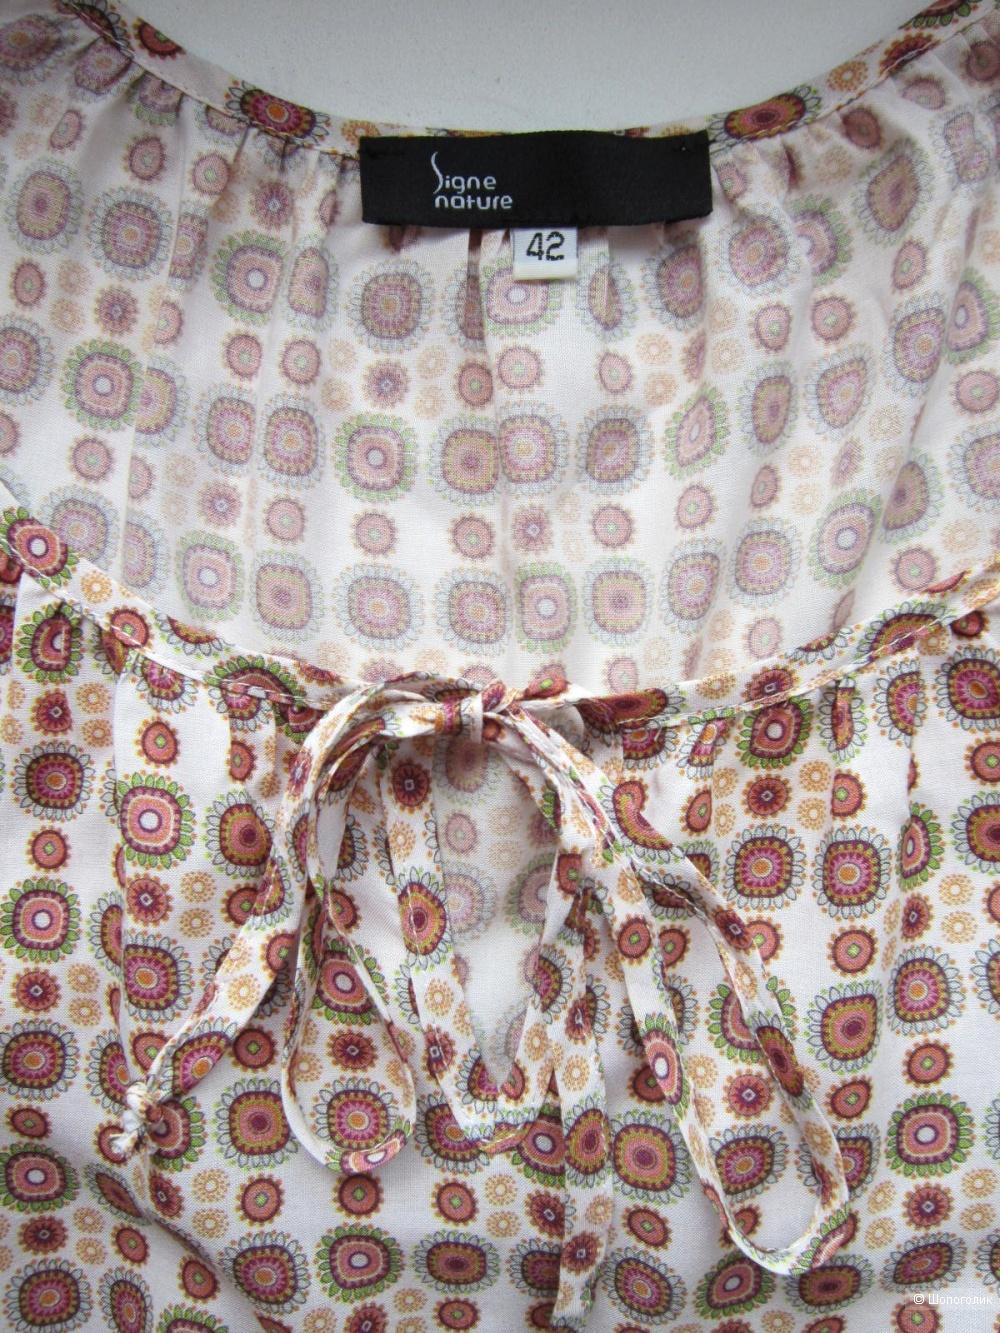 Блузка, Signe Nature, 48/50 размер